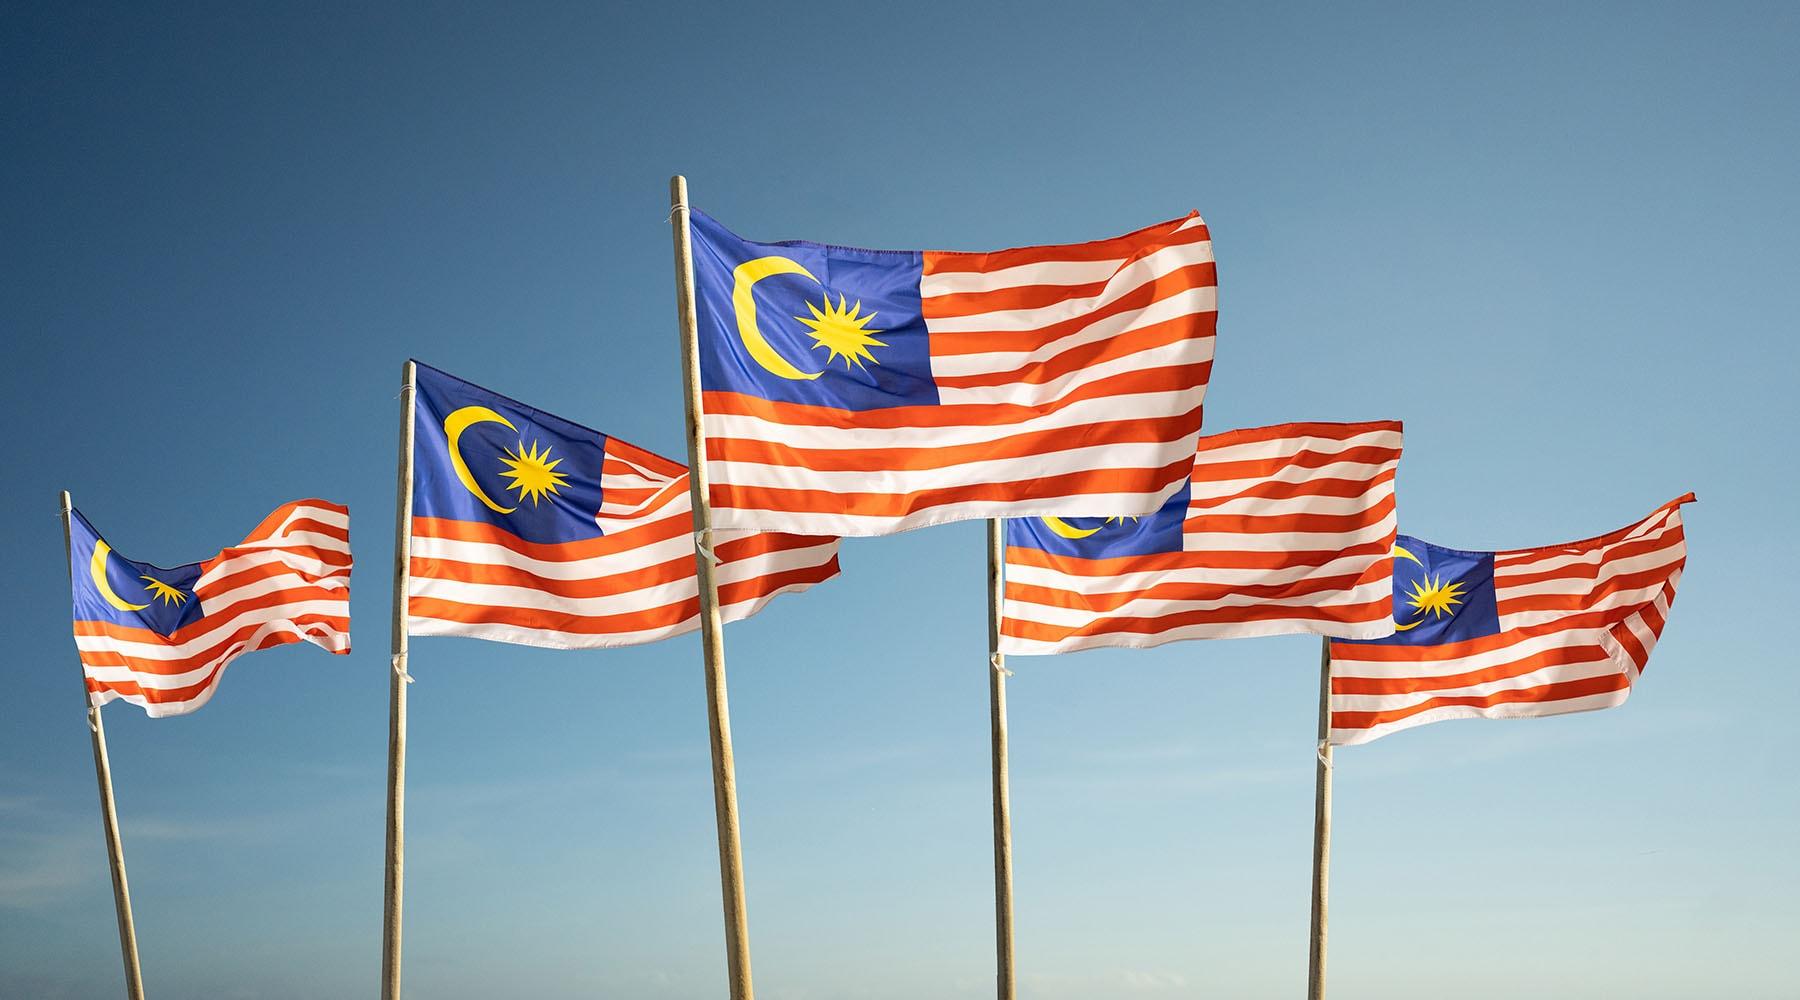 Standard Chartered Malaysia – Standard Chartered Malaysia